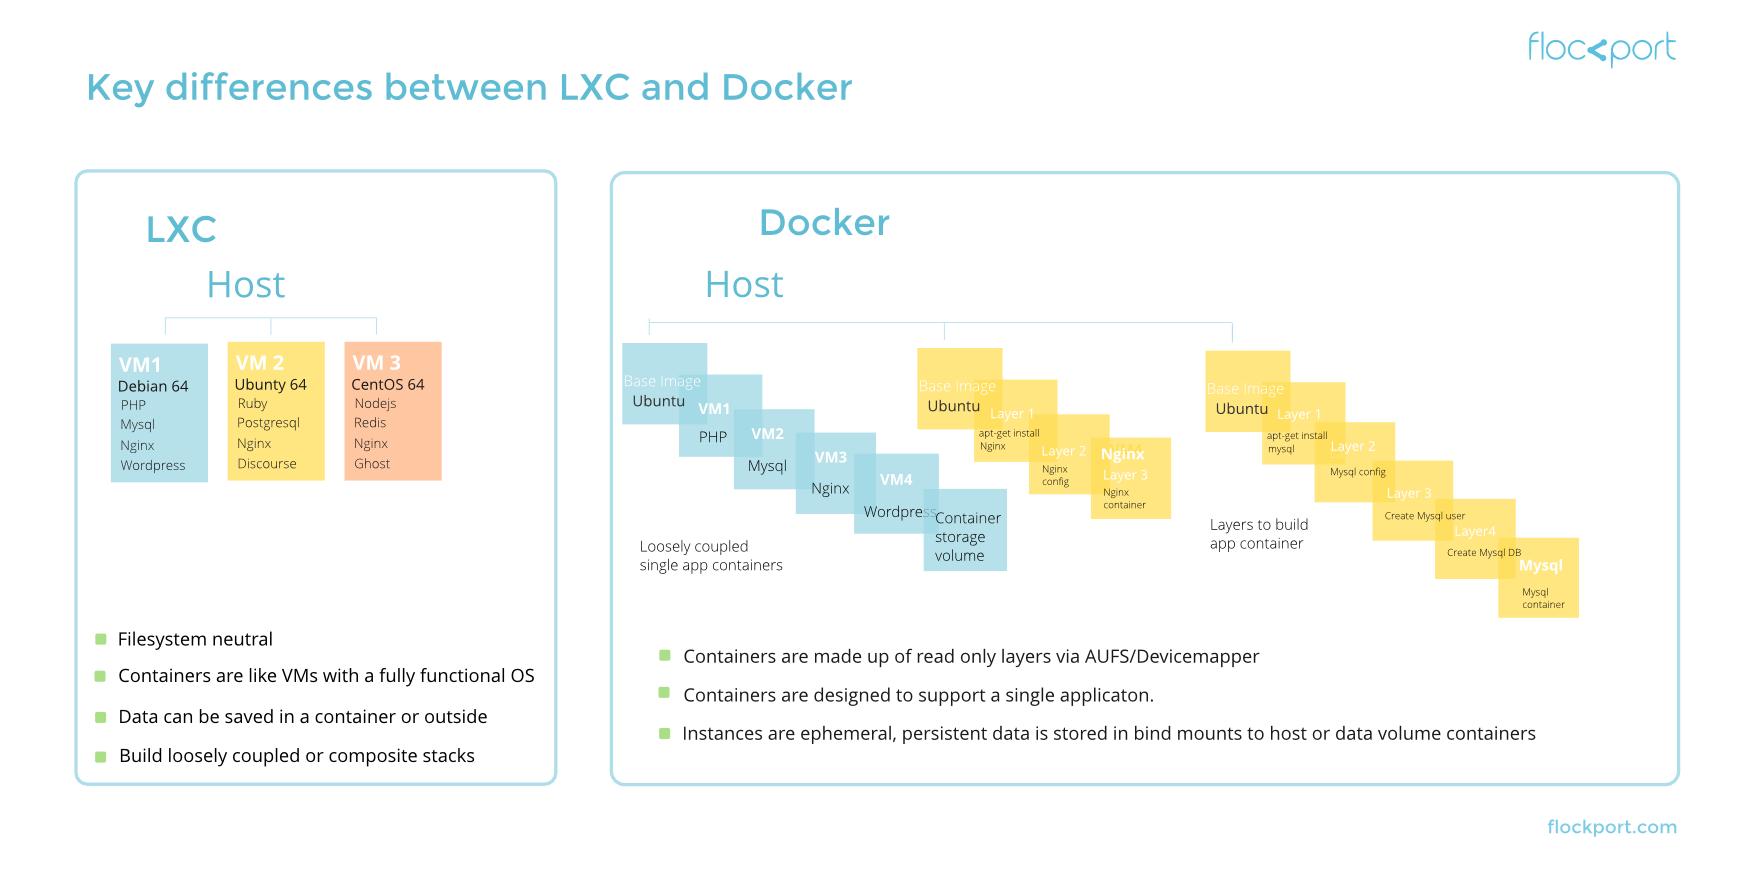 Flockport - LXC vs Docker